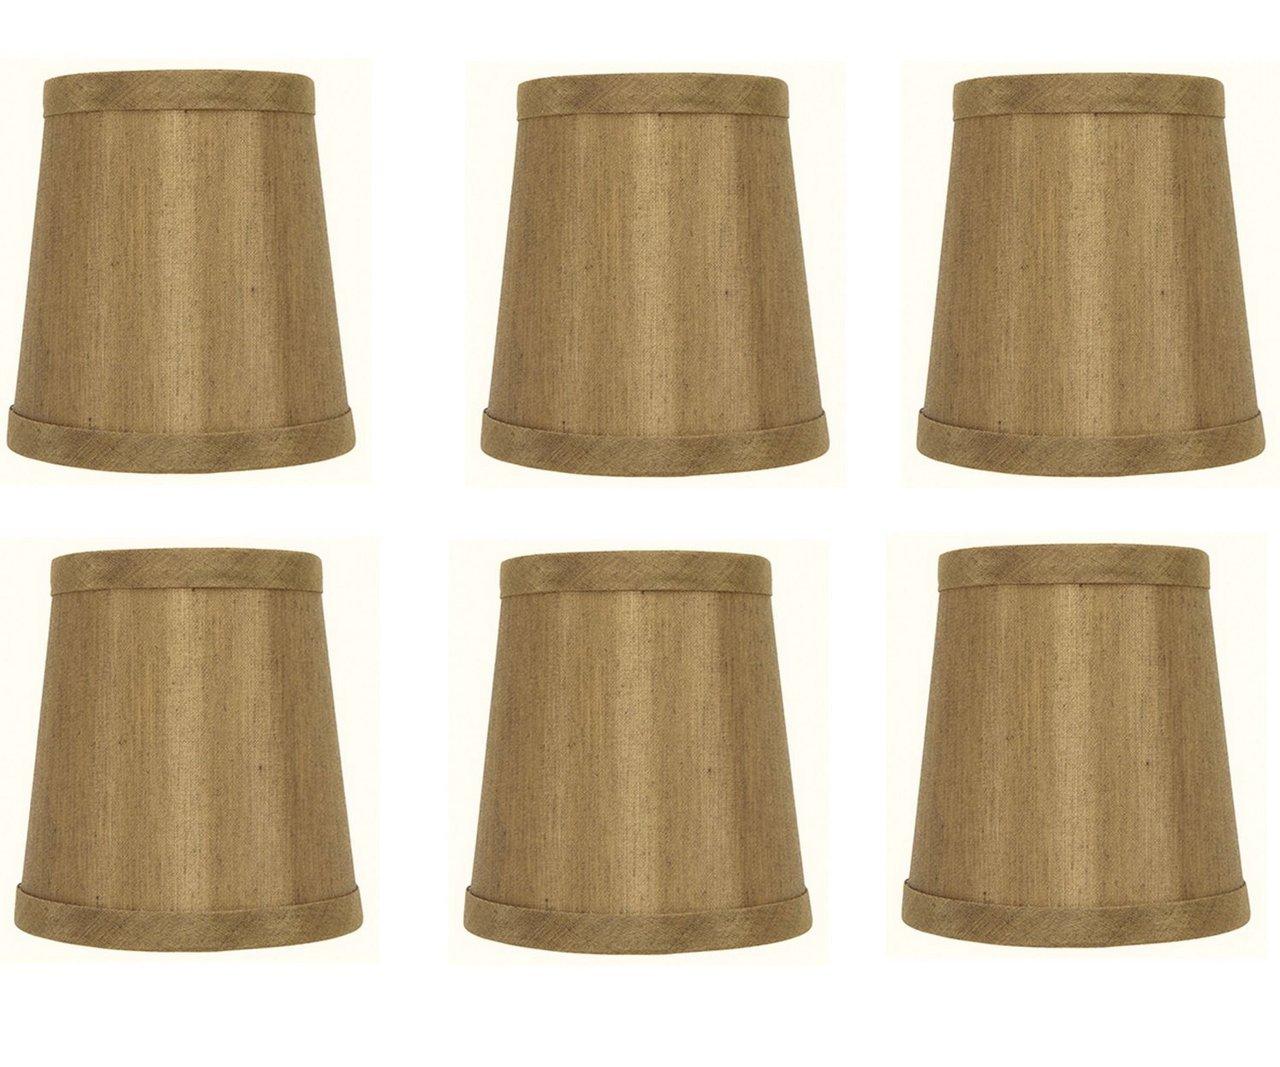 Upgradelights Bronze Barrel Drum 4 Inch Clip On Chandelier Shades (Set of 6) 3x4x4